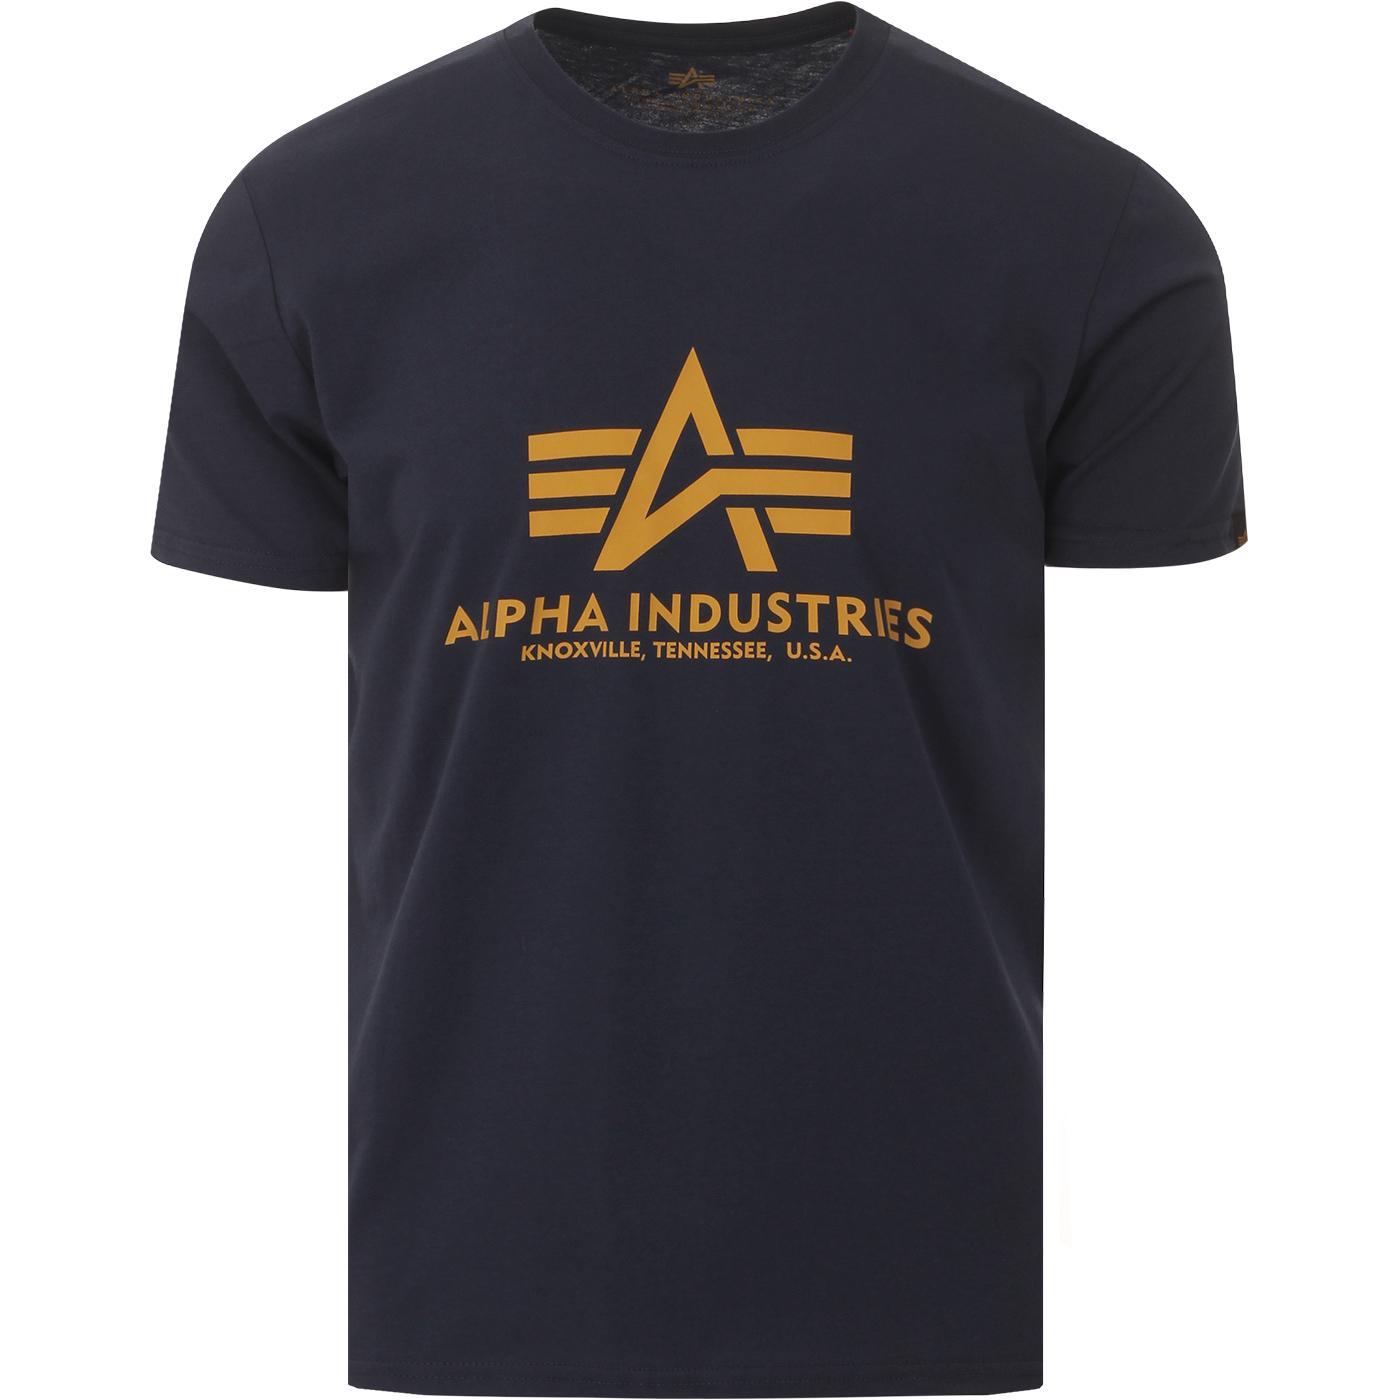 ALPHA INDUSTRIES Retro Logo Tee (New Navy)